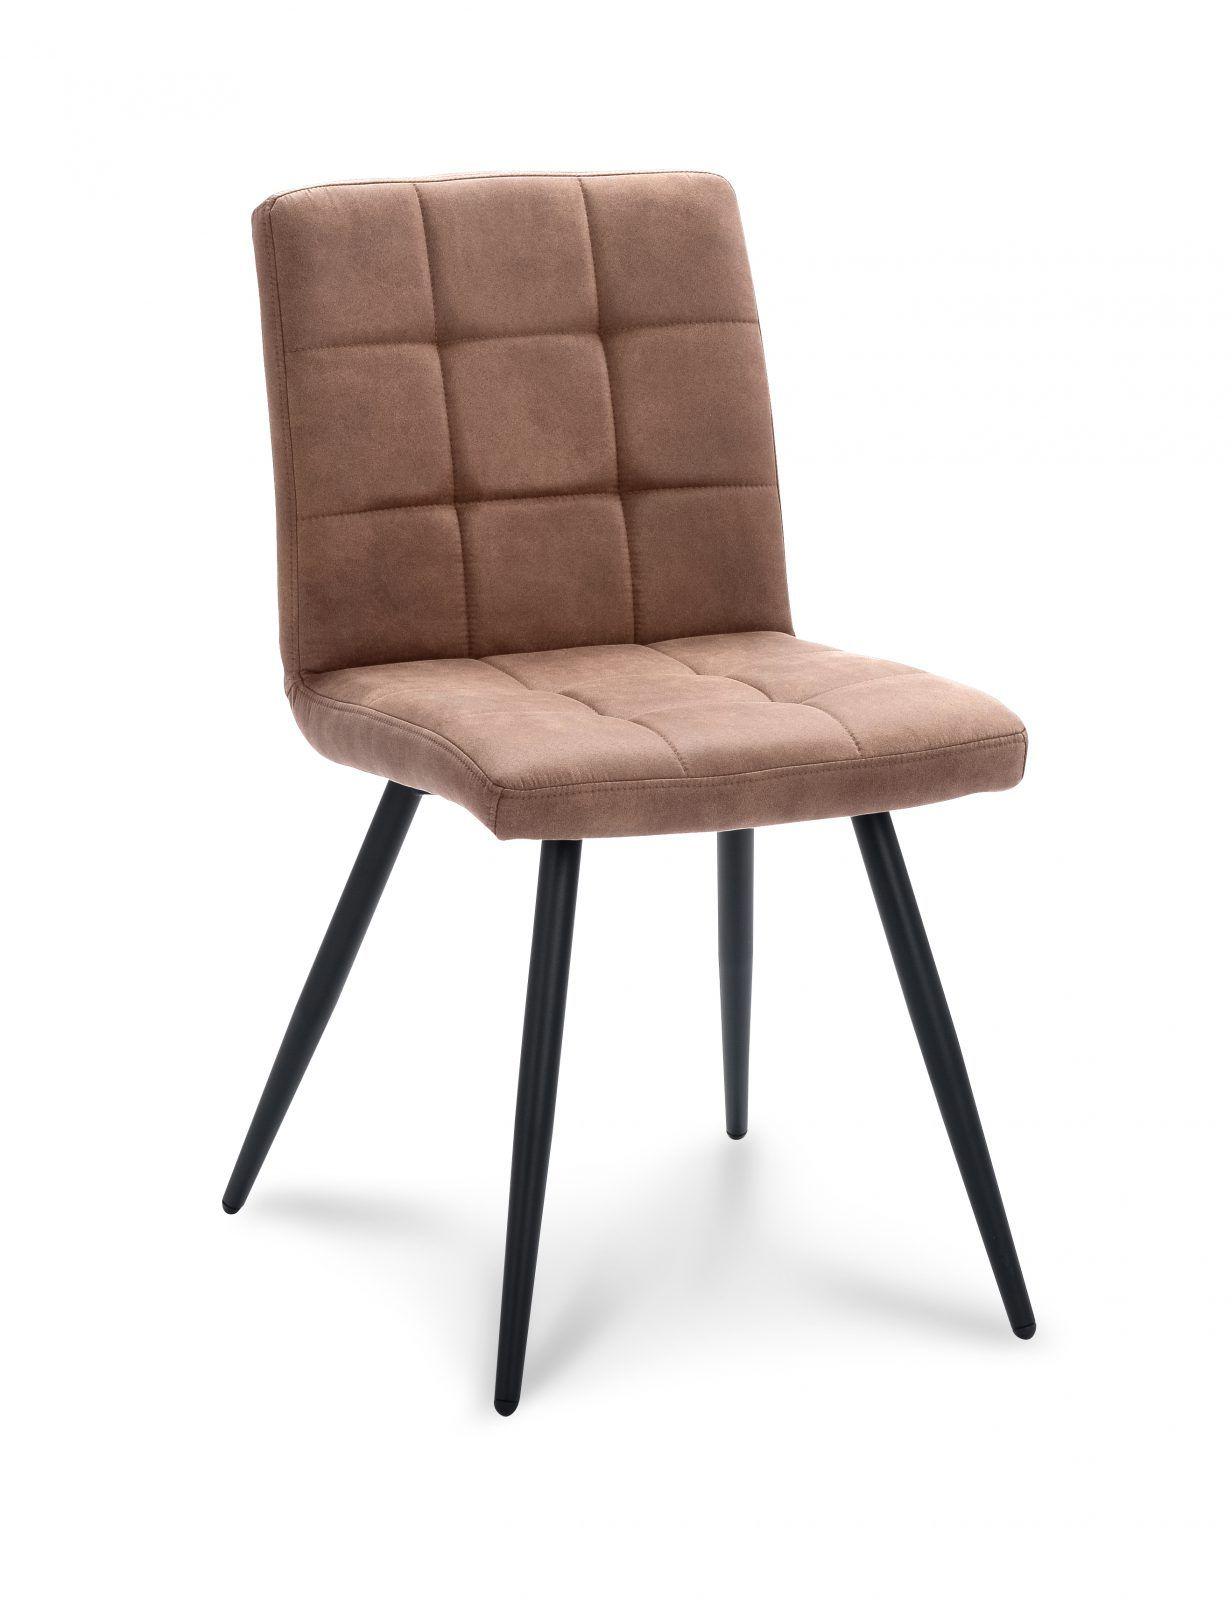 Stoel 'YORK' in stof in 2020 | Stoelen, Tafel stoelen, Tafel